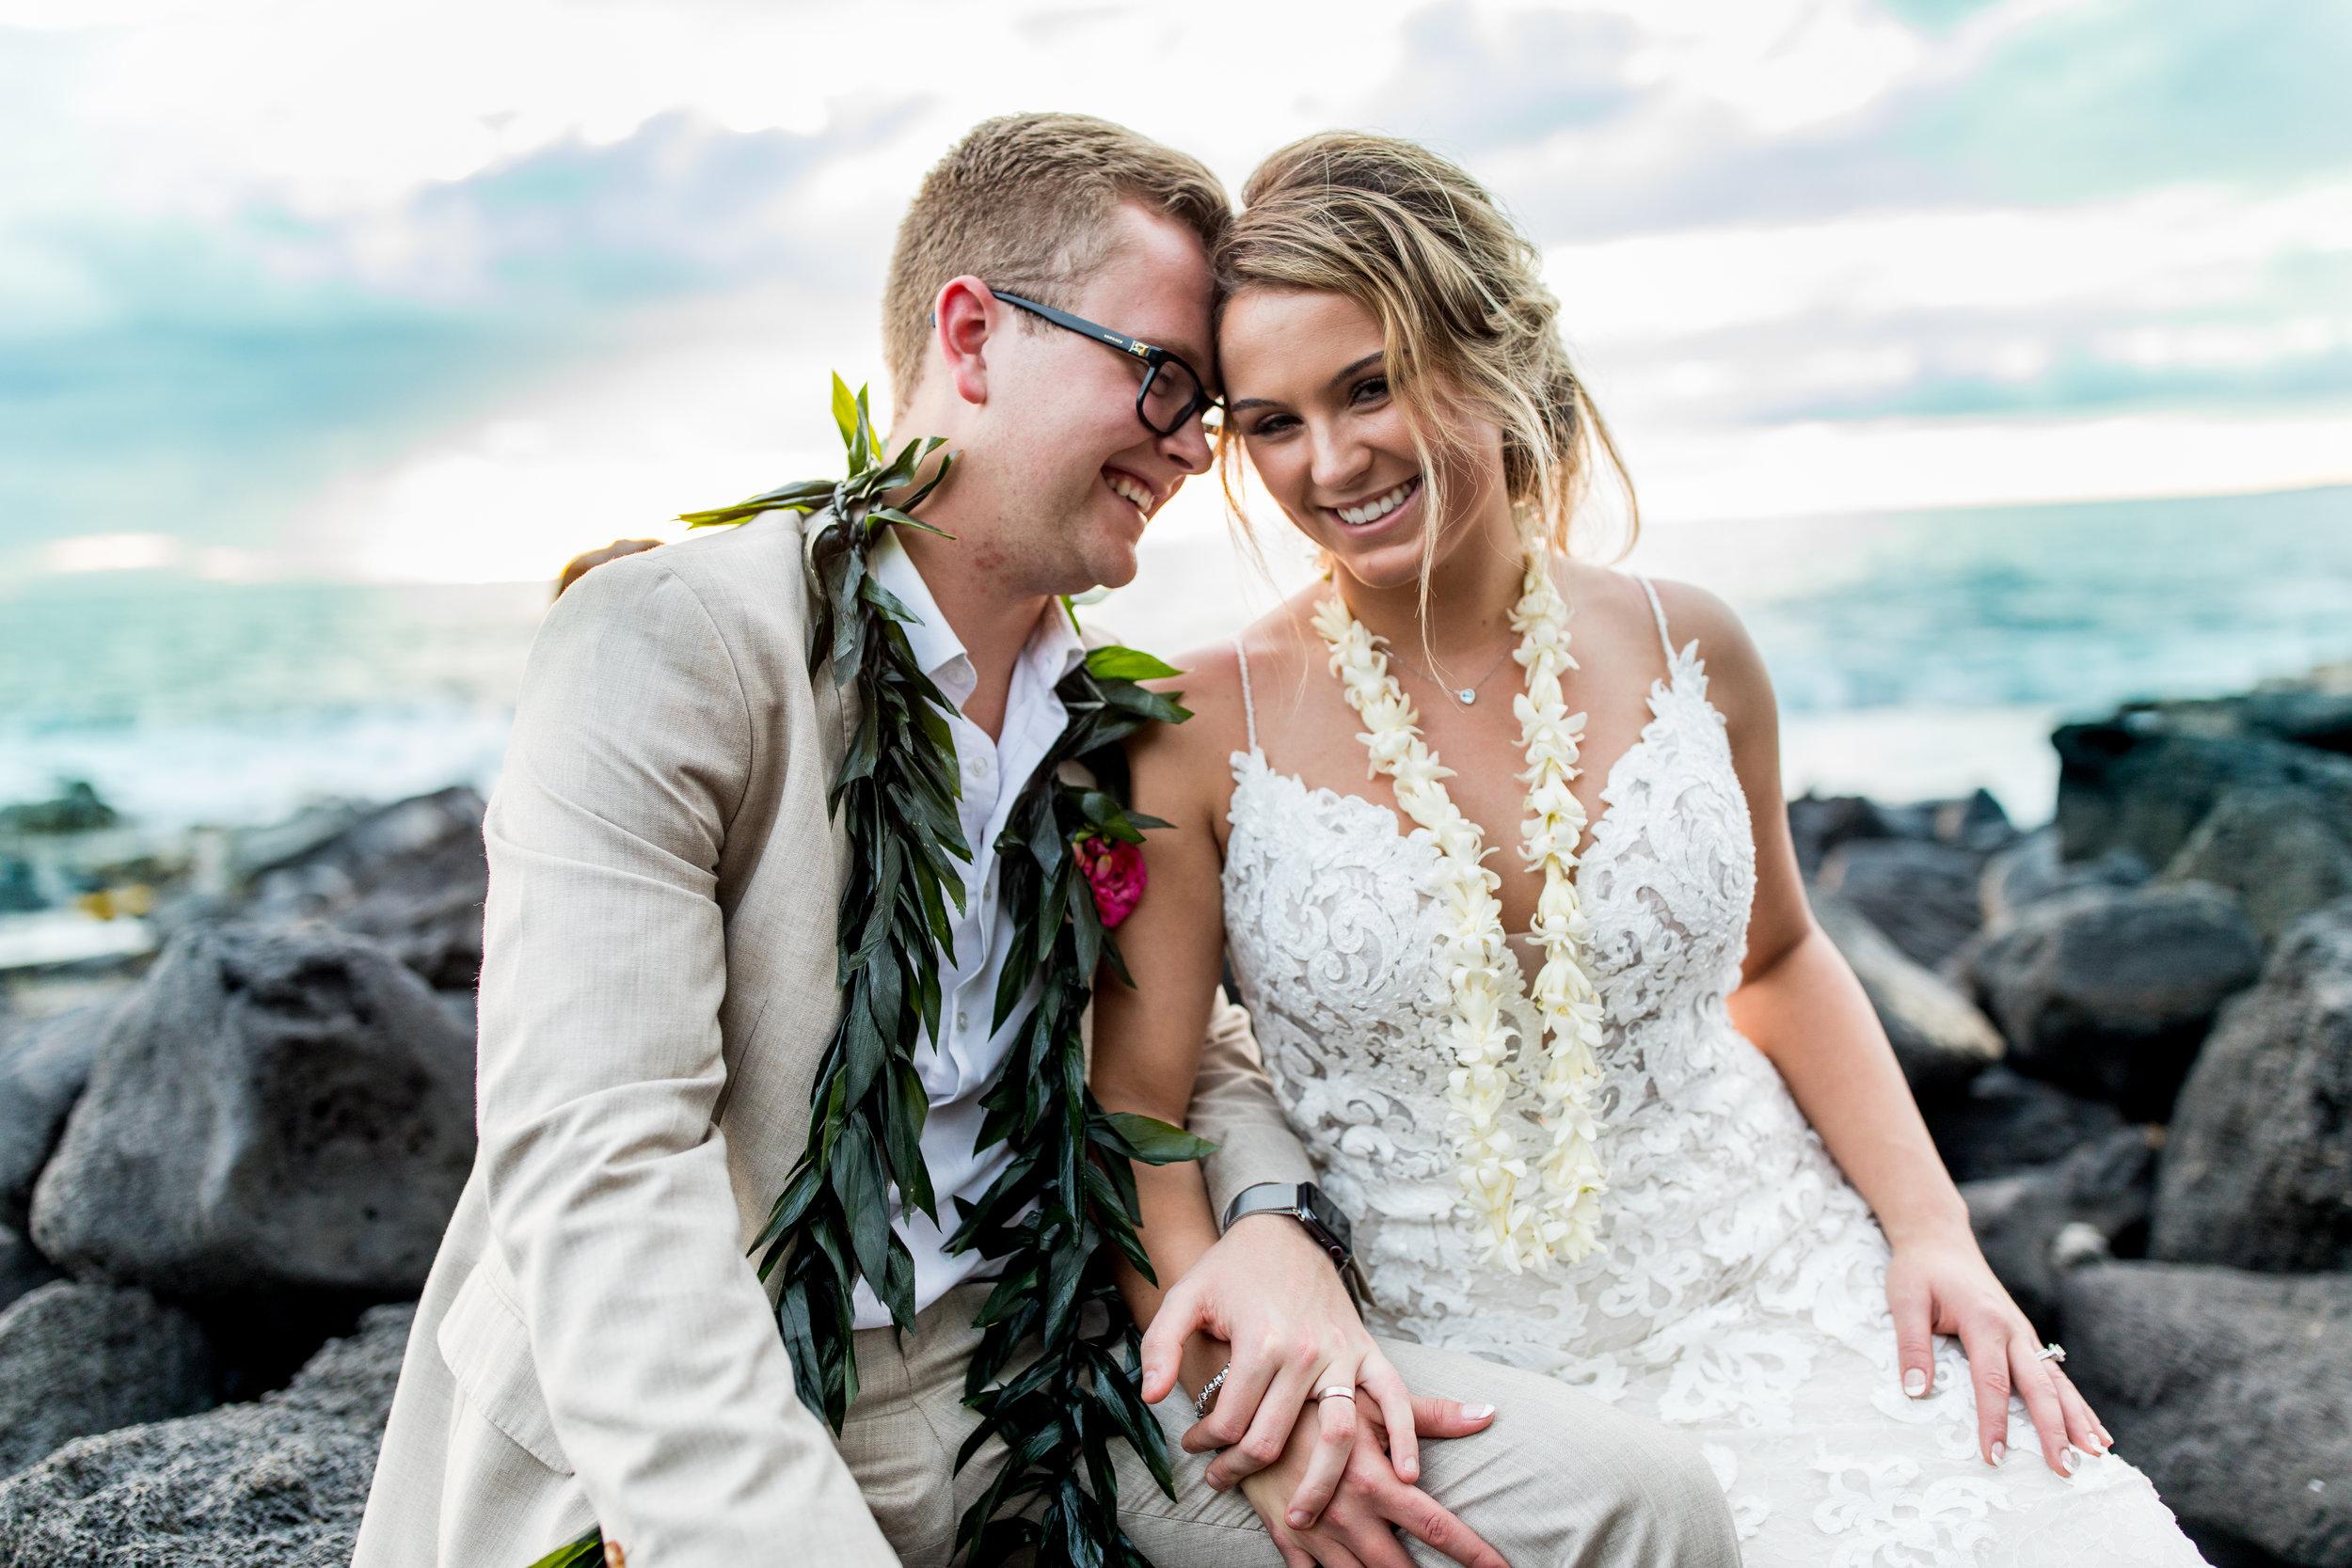 kelilina photography hawaii florida destination wedding photographer-10.jpg